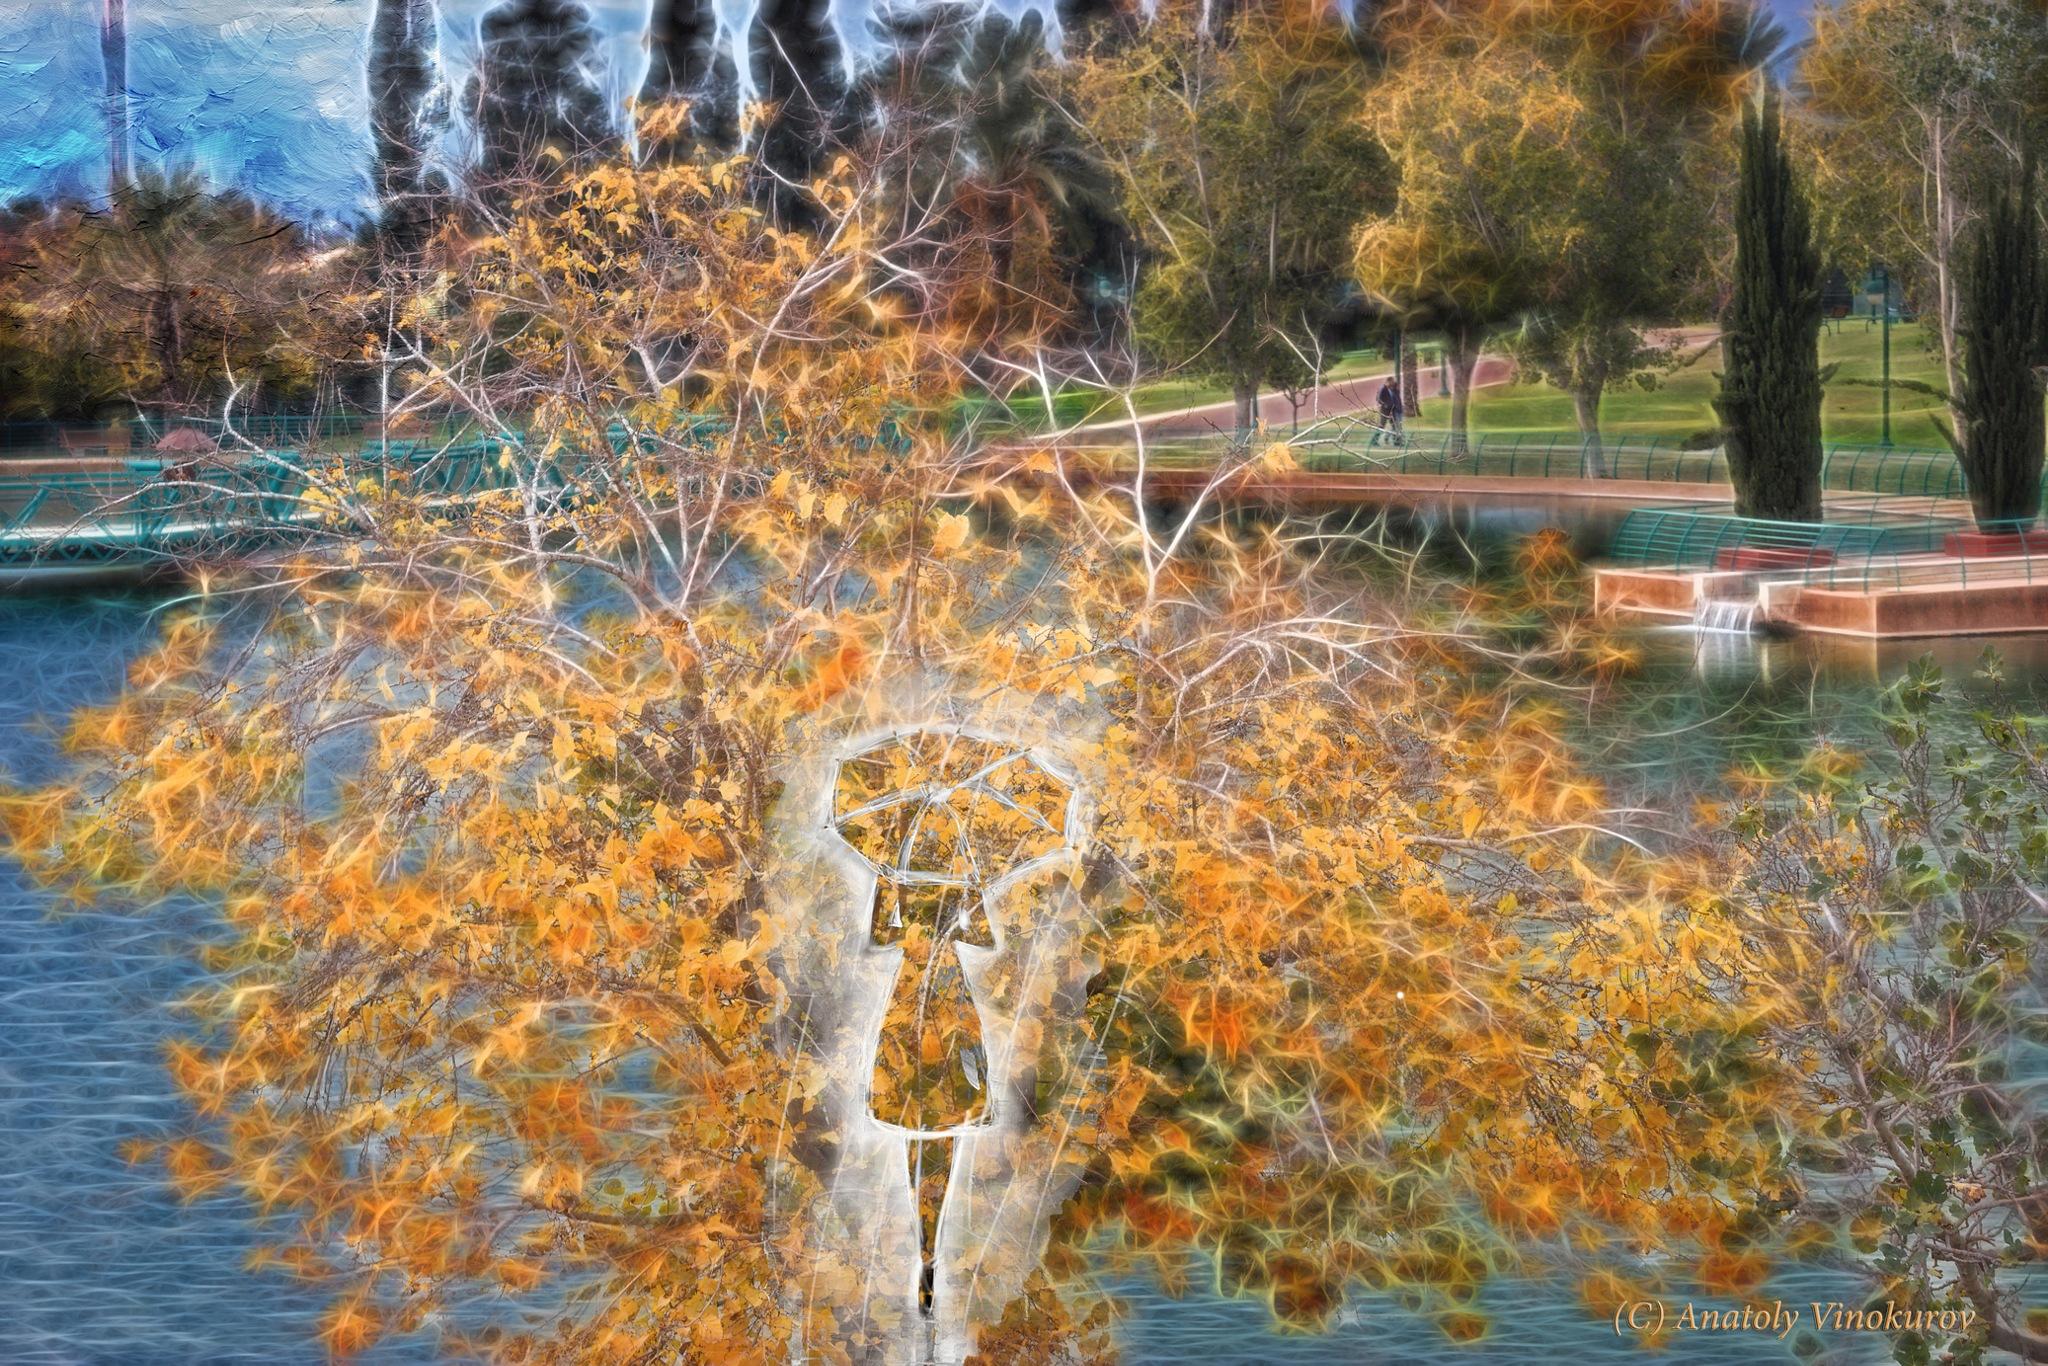 Autumn has come by Anatoly Vinokurov